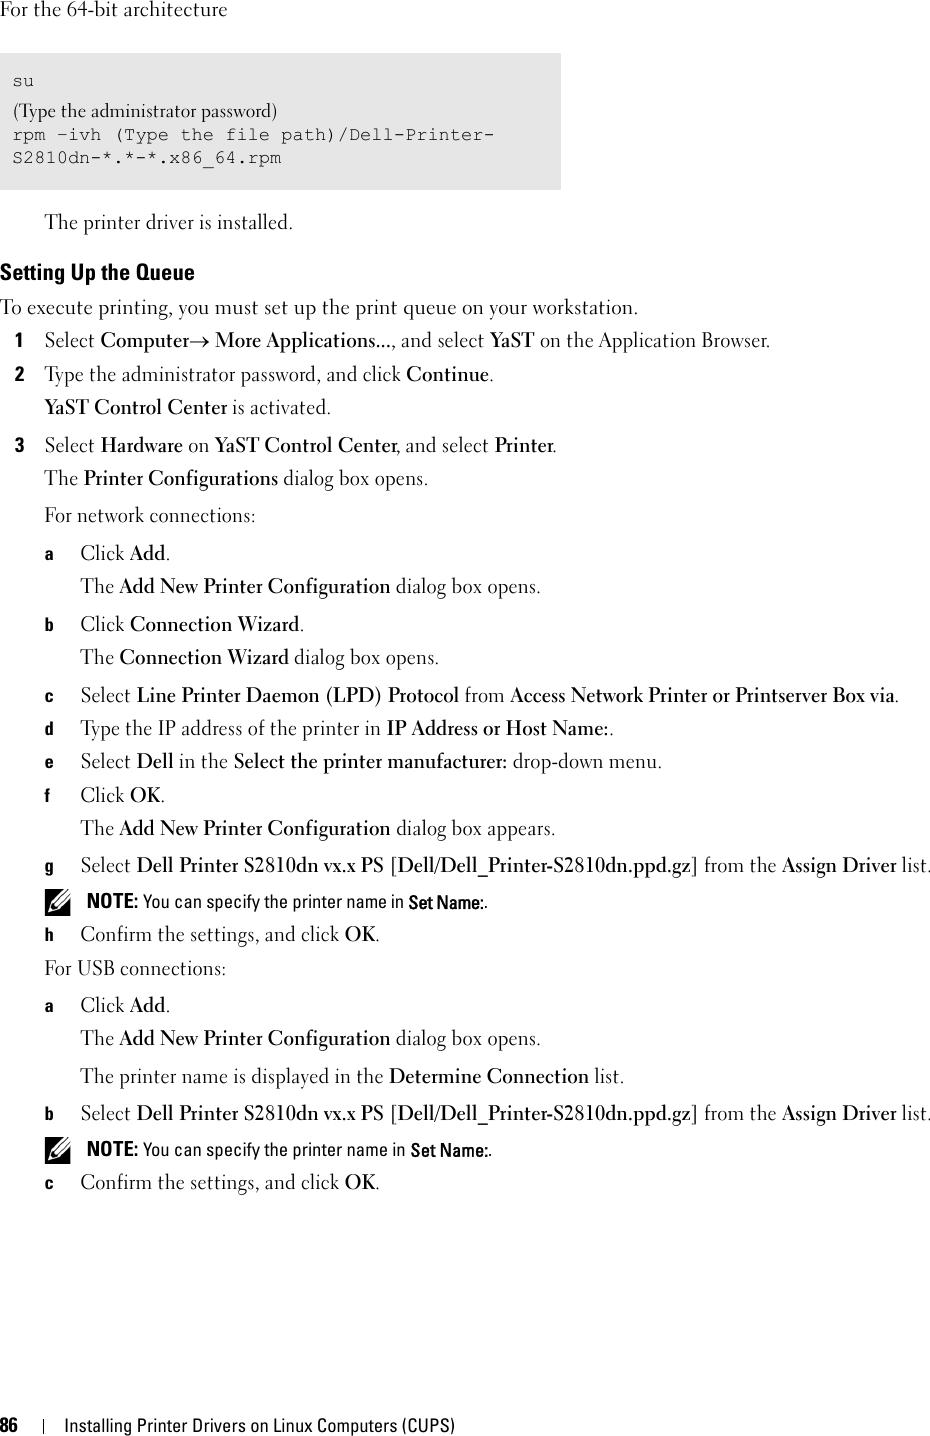 Dell s2810dn printer Smart User's Guide User Manual En us